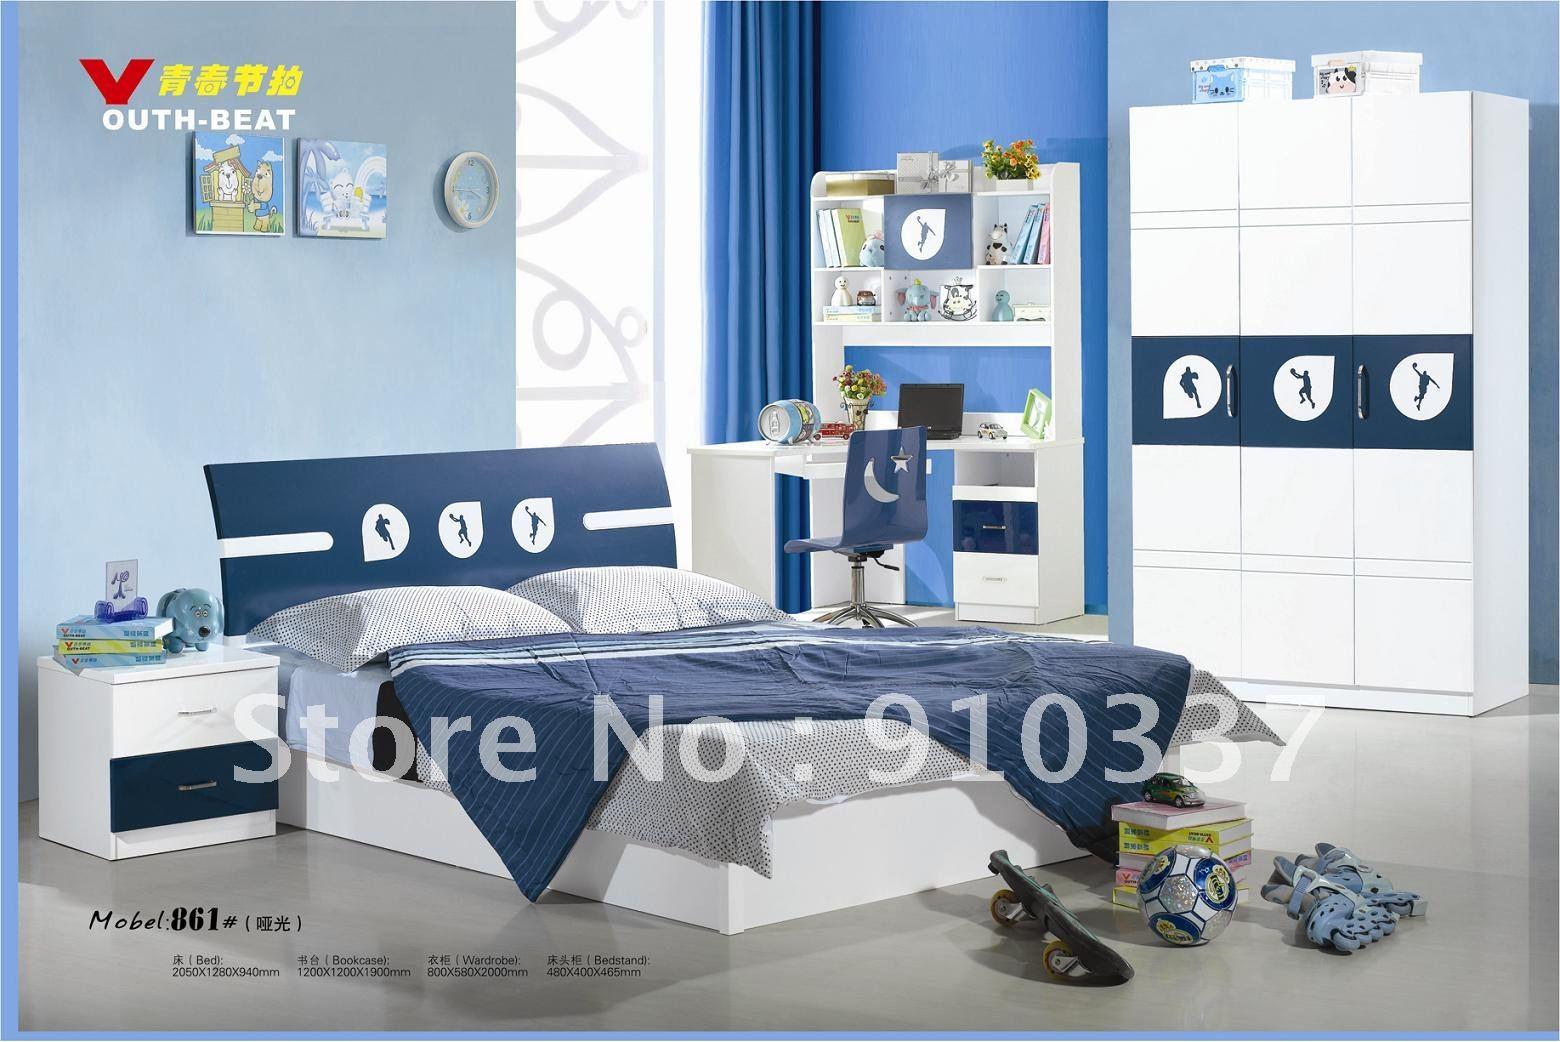 4 Pcs New Full Size Bedroom Set Mdf Panels Kids Furniture Bookcase Bed Nightstand Three Doors Wardrobe Wardrobe Furniture Design Wardrobe With Sliding Doorswardrobe Bedroom Furniture Aliexpress